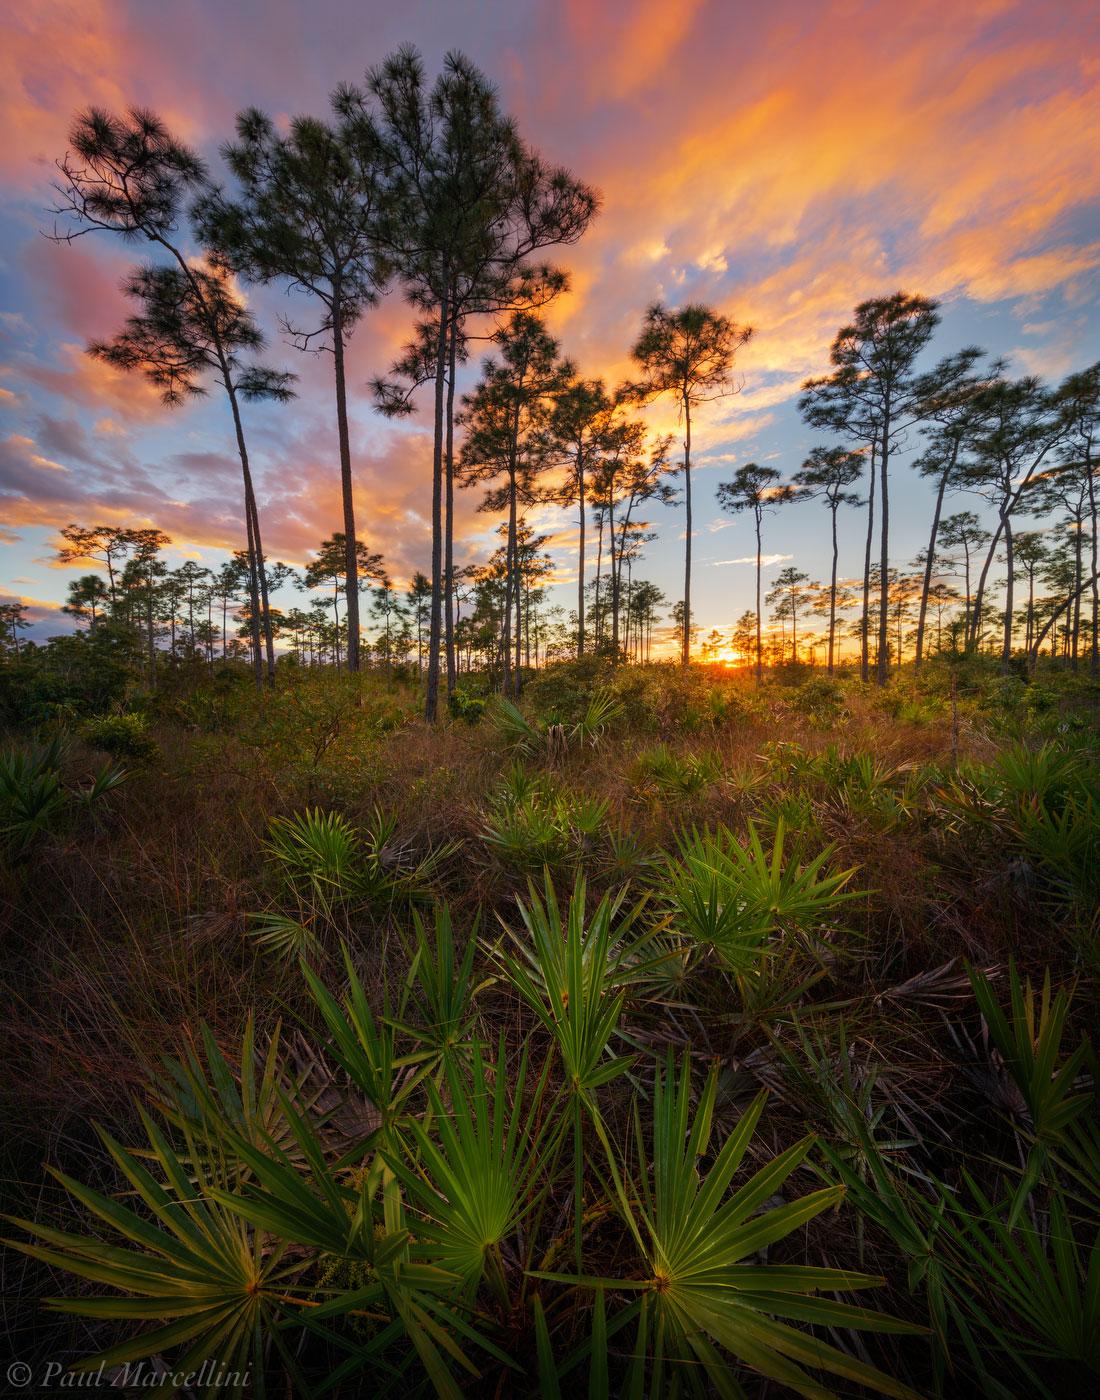 pine rocklands, Everglades National Park, Florida, sunset, photo